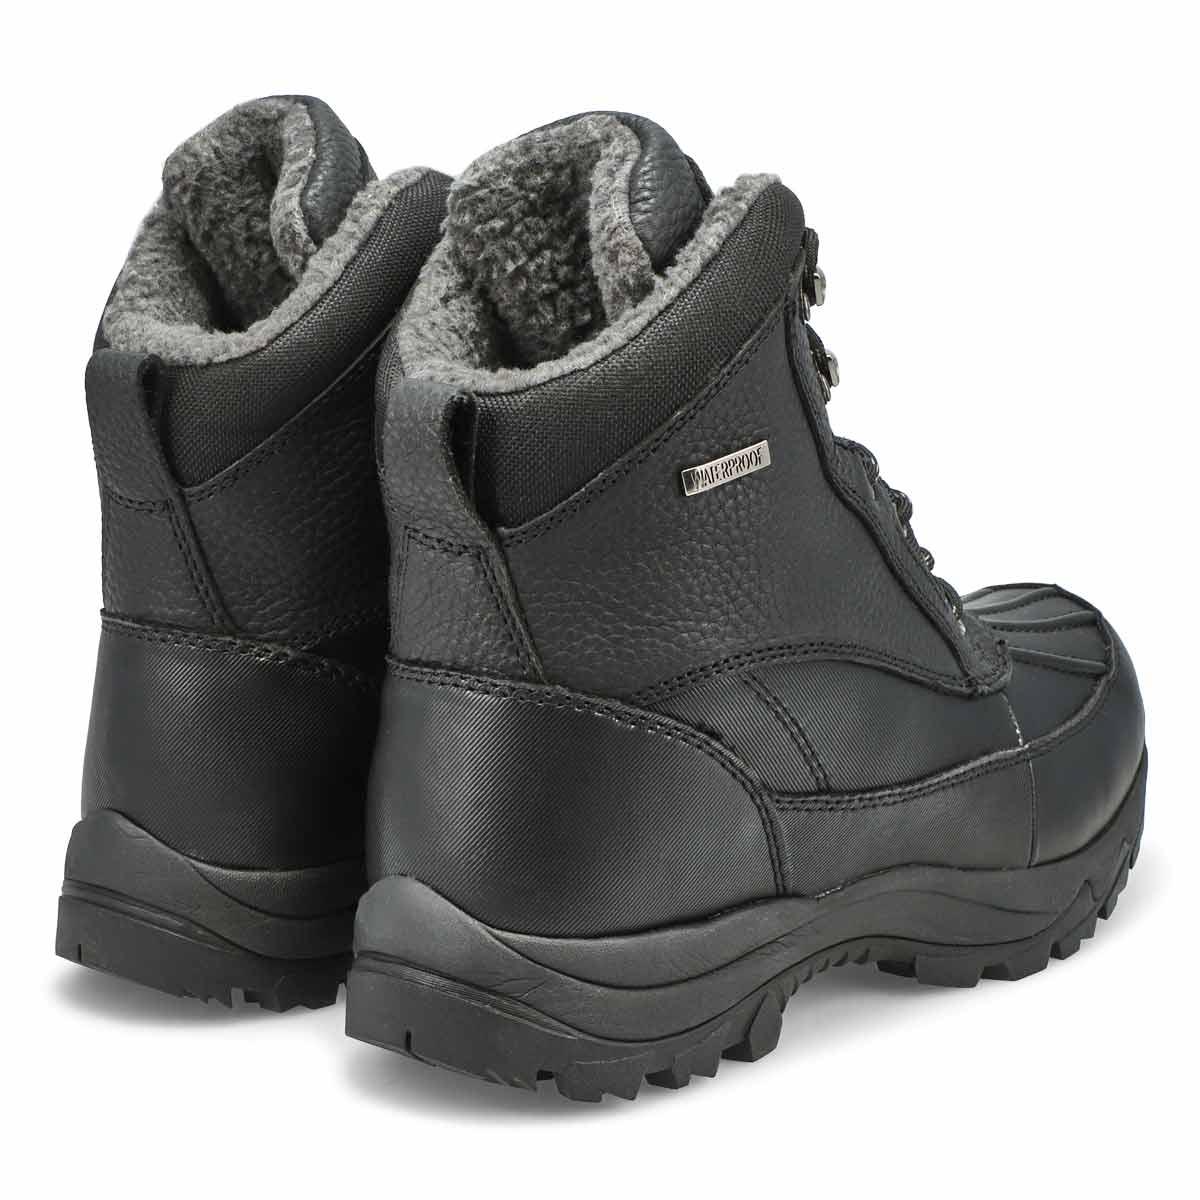 Mns Murphy black wtpf winter boot